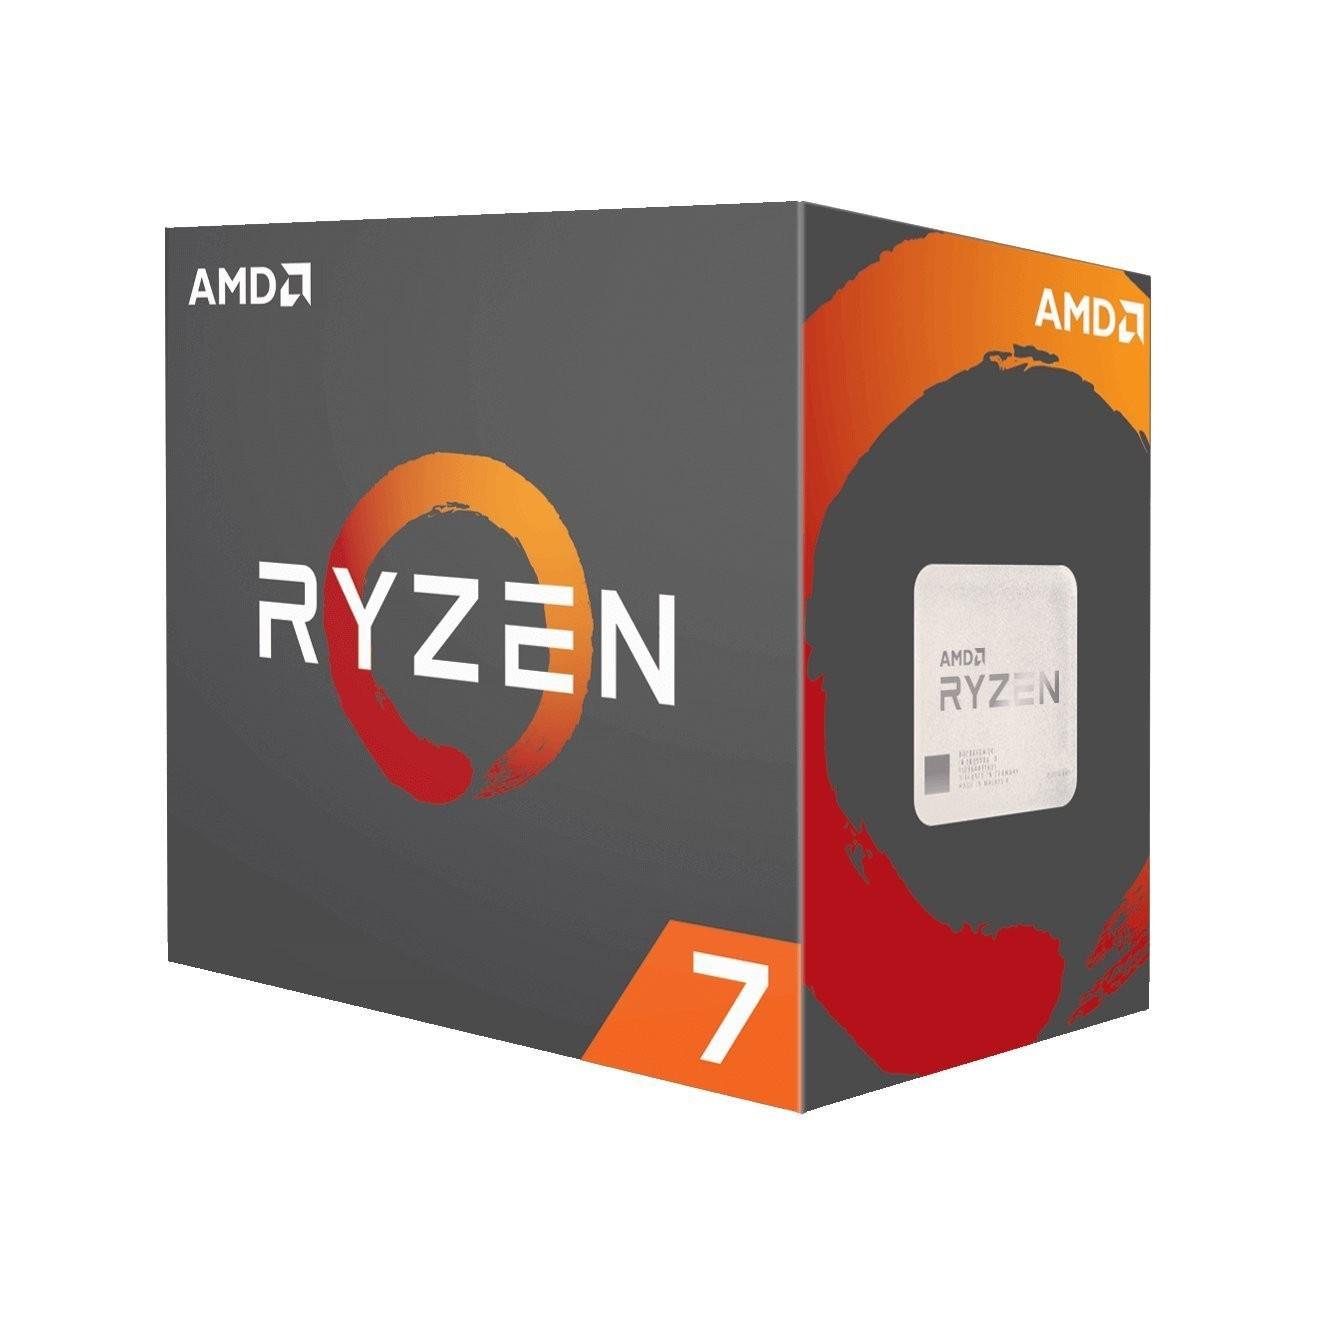 AMD CPU RYZEN 7 1800X - 8-CORE 3.6GHZ SOCKET AM4 - DESKTOP PROCESSOR - YD180XBCAEWOF